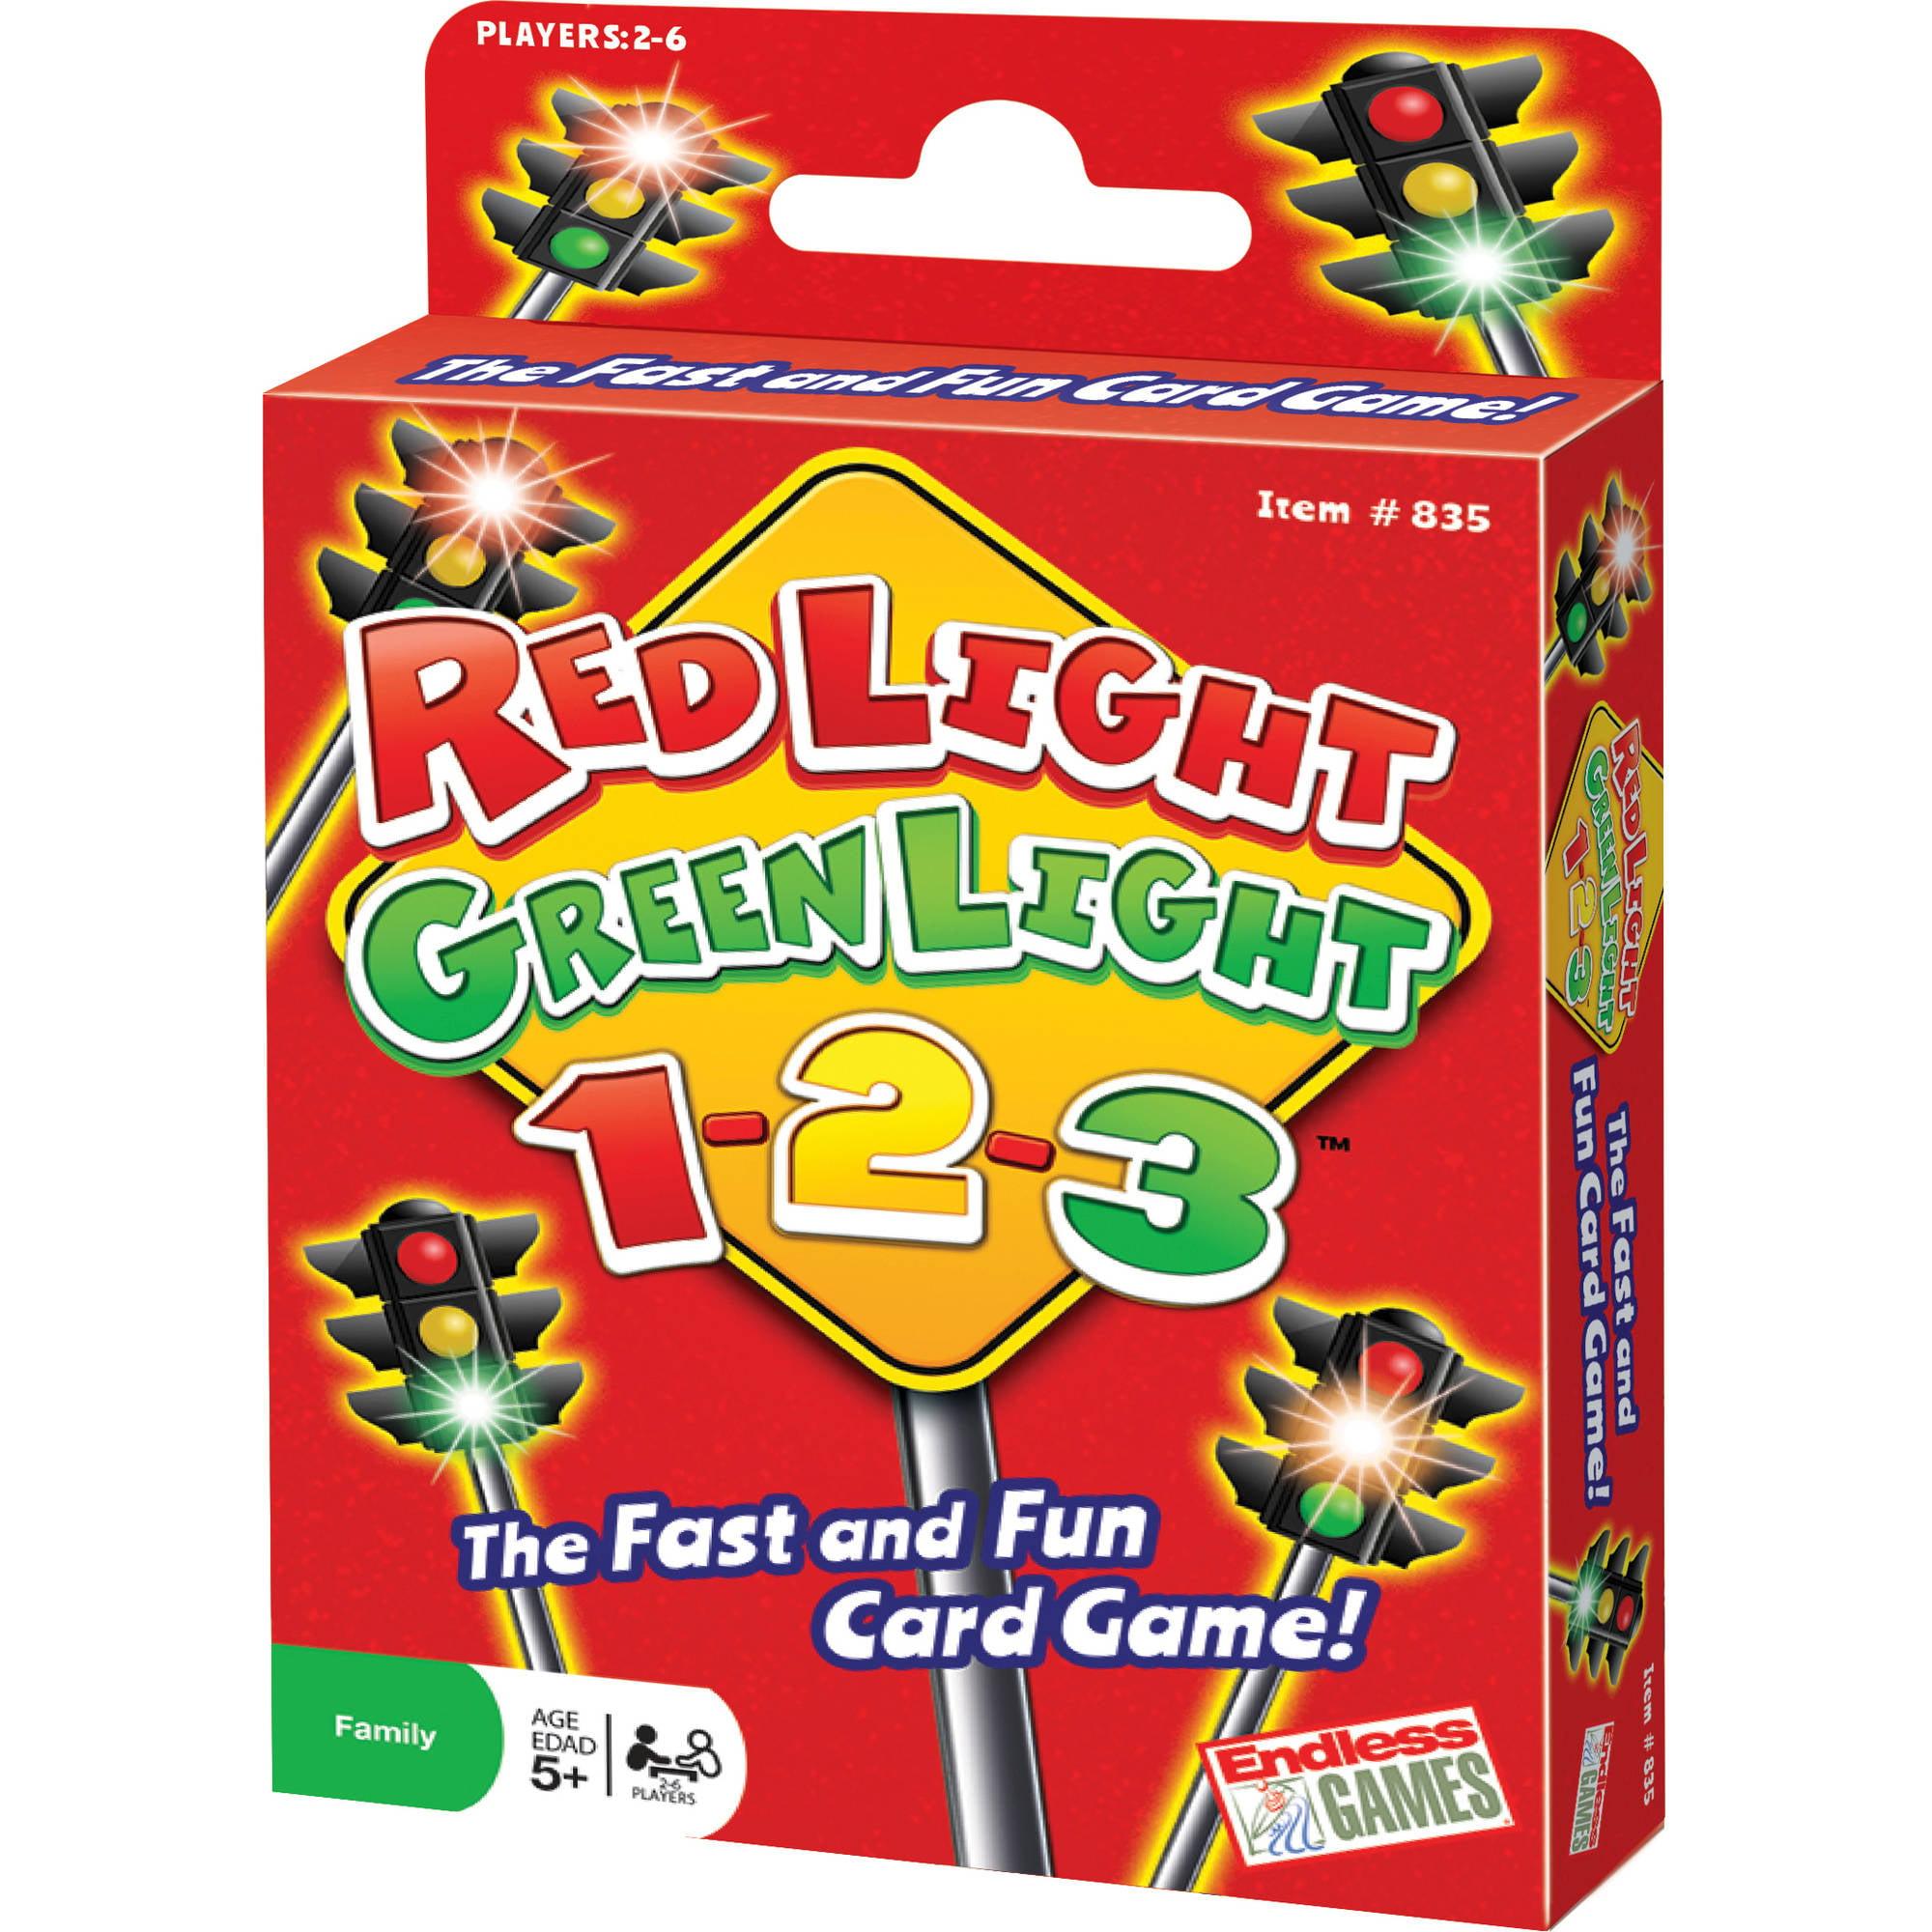 Red Light, Green Light, 1-2-3